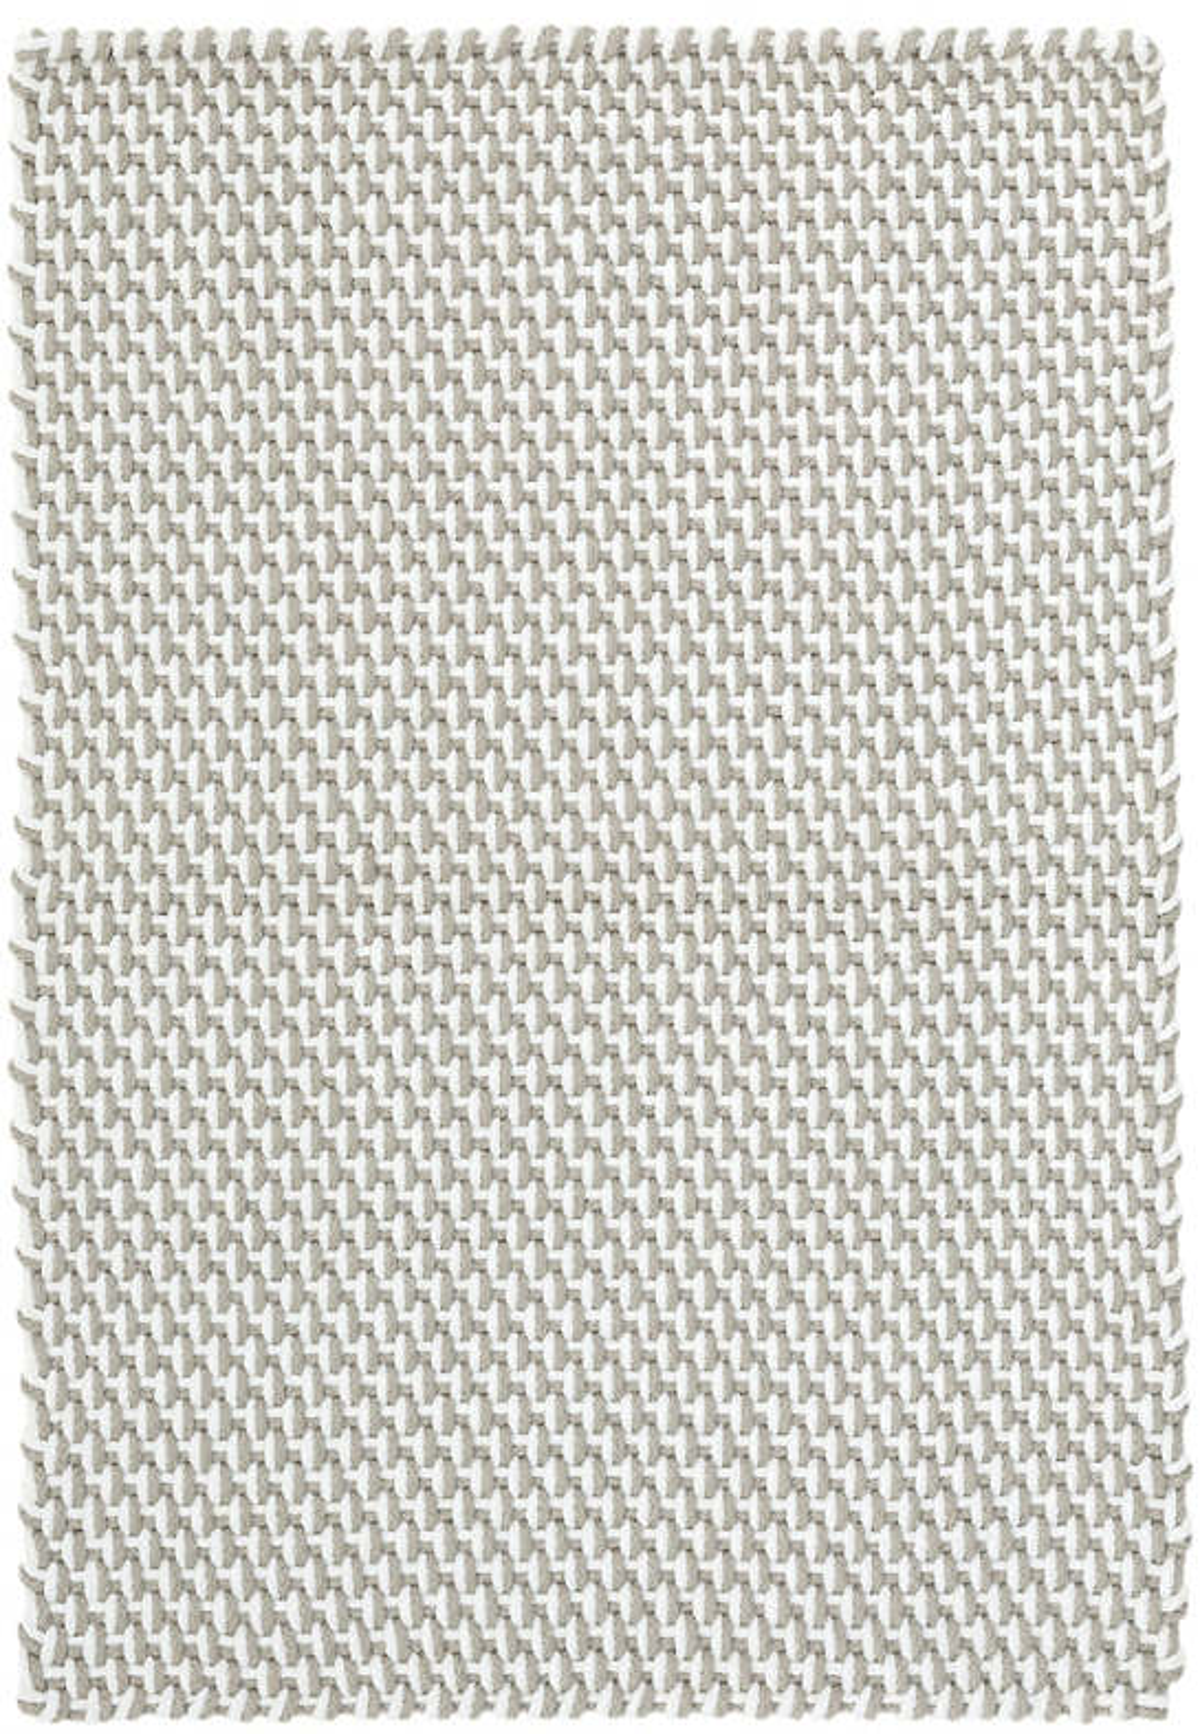 Two-Tone Rope Platinum/White Indoor/Outdoor Rug